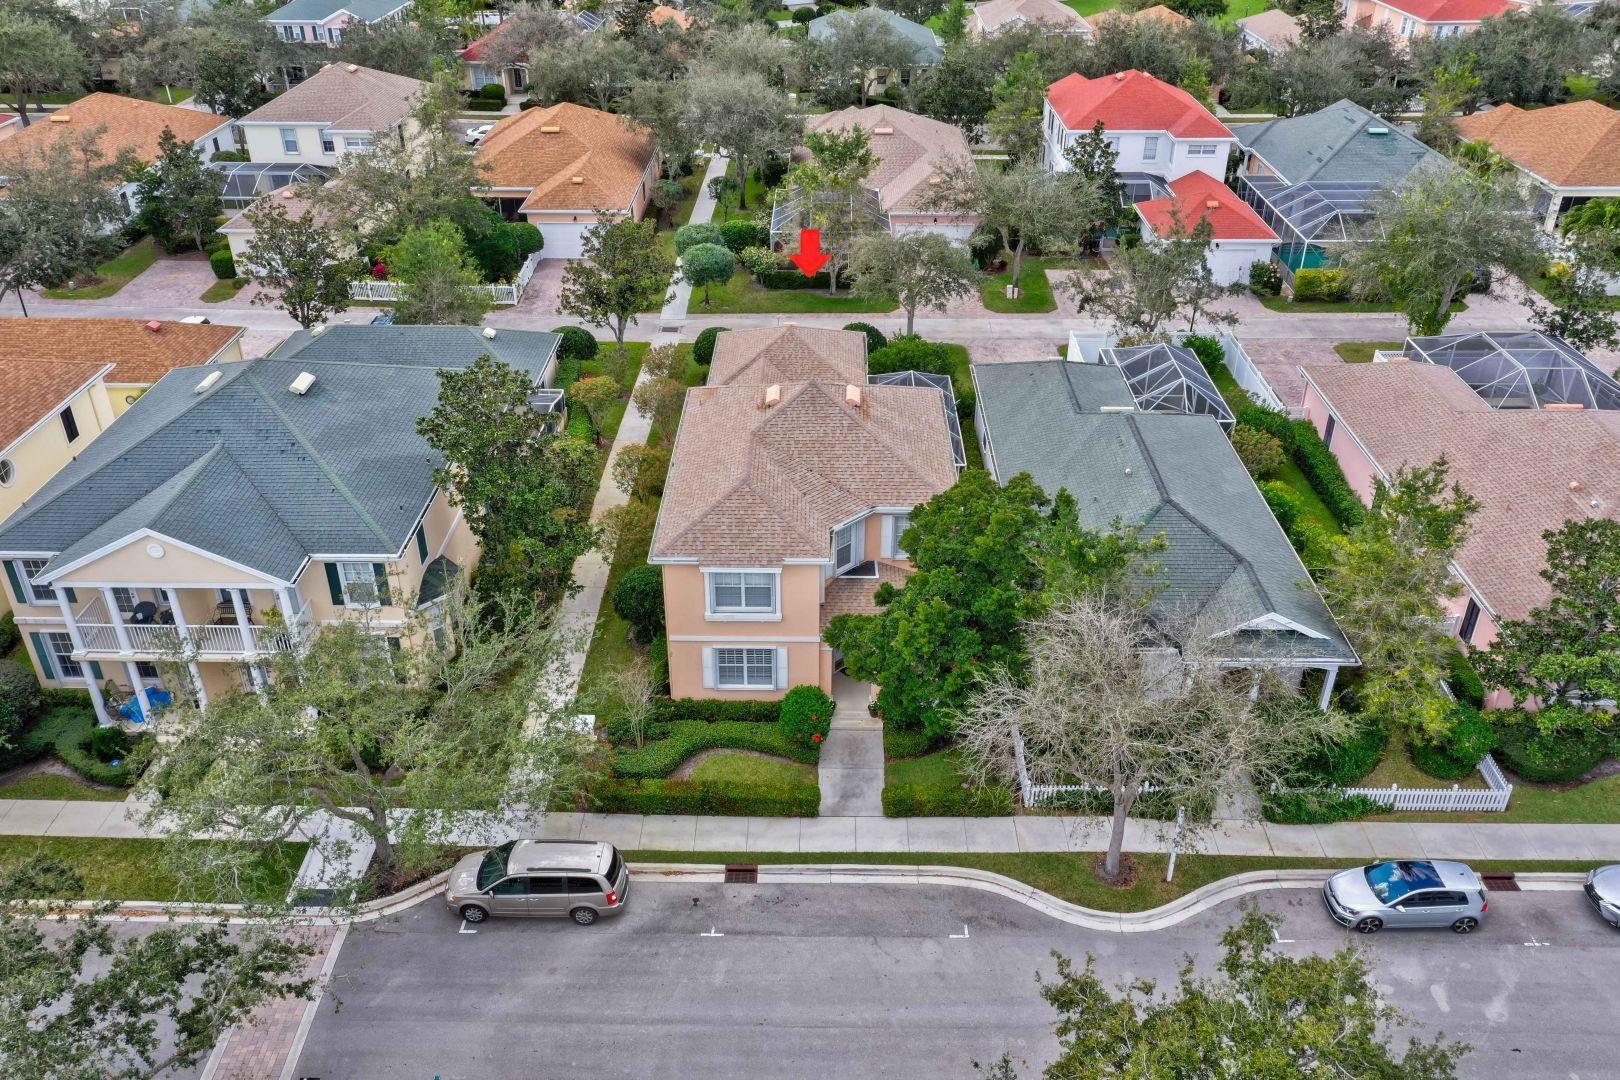 114 Milbridge Drive, Jupiter, Florida 33458, 3 Bedrooms Bedrooms, ,2.1 BathroomsBathrooms,A,Single family,Milbridge,RX-10505488